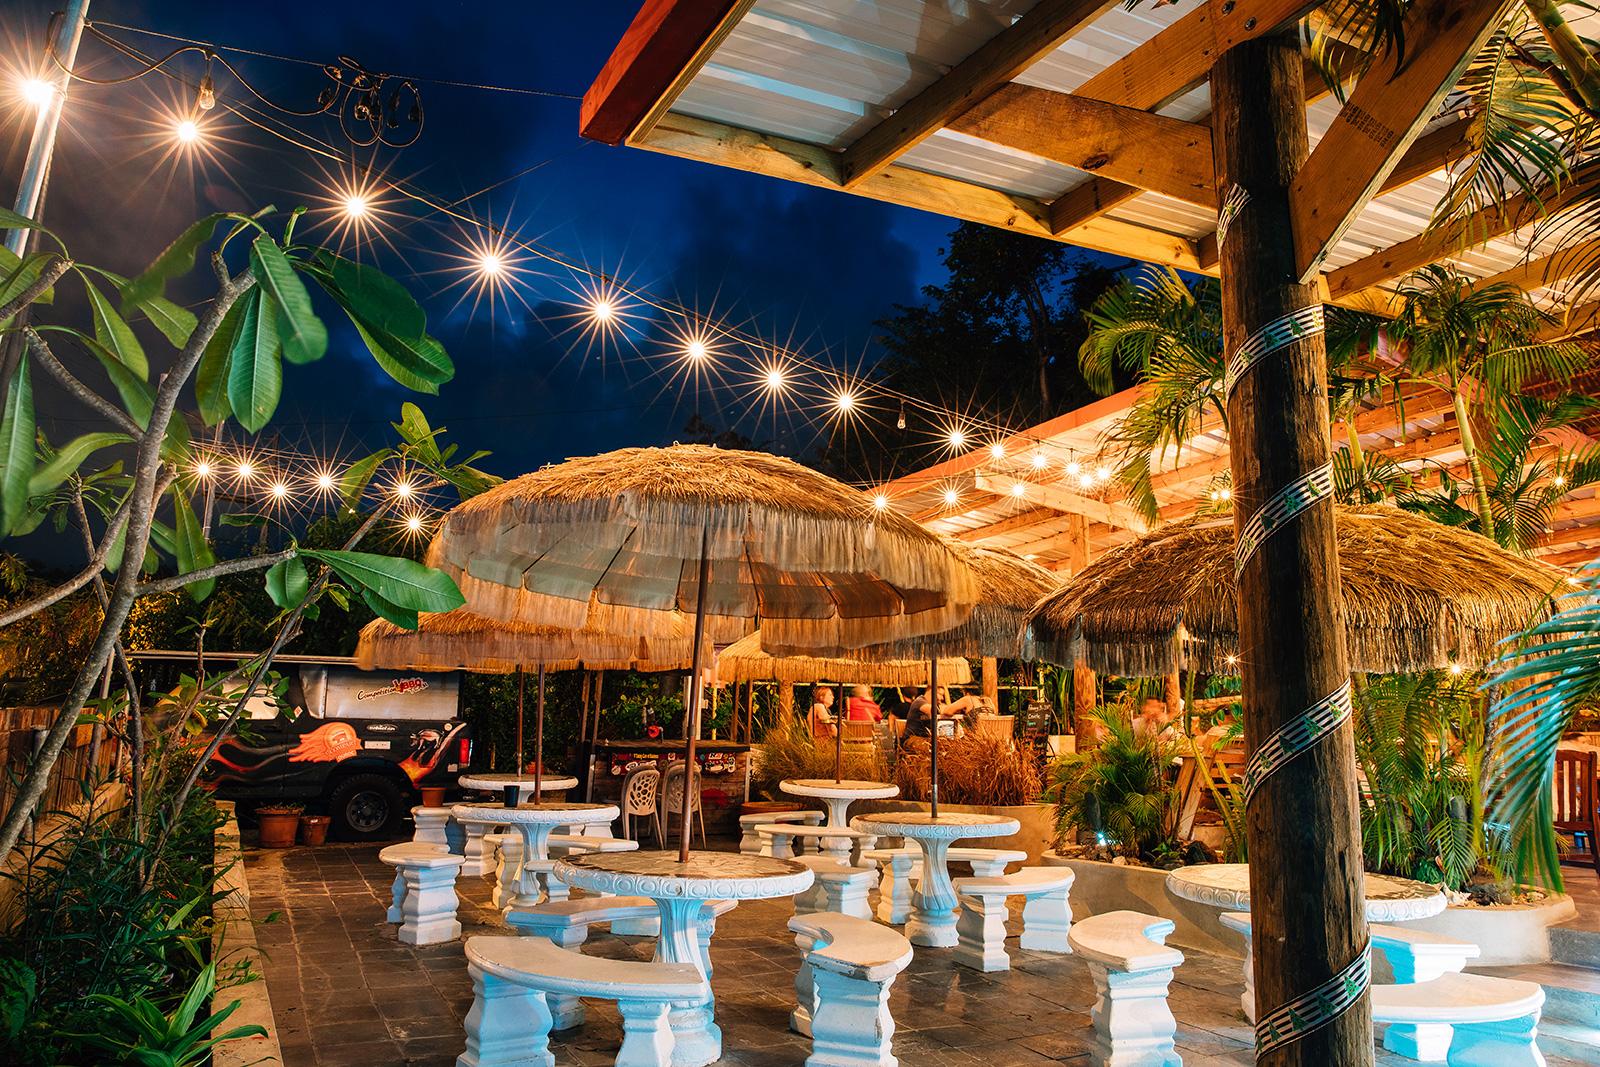 Where To Eat In Fajardo